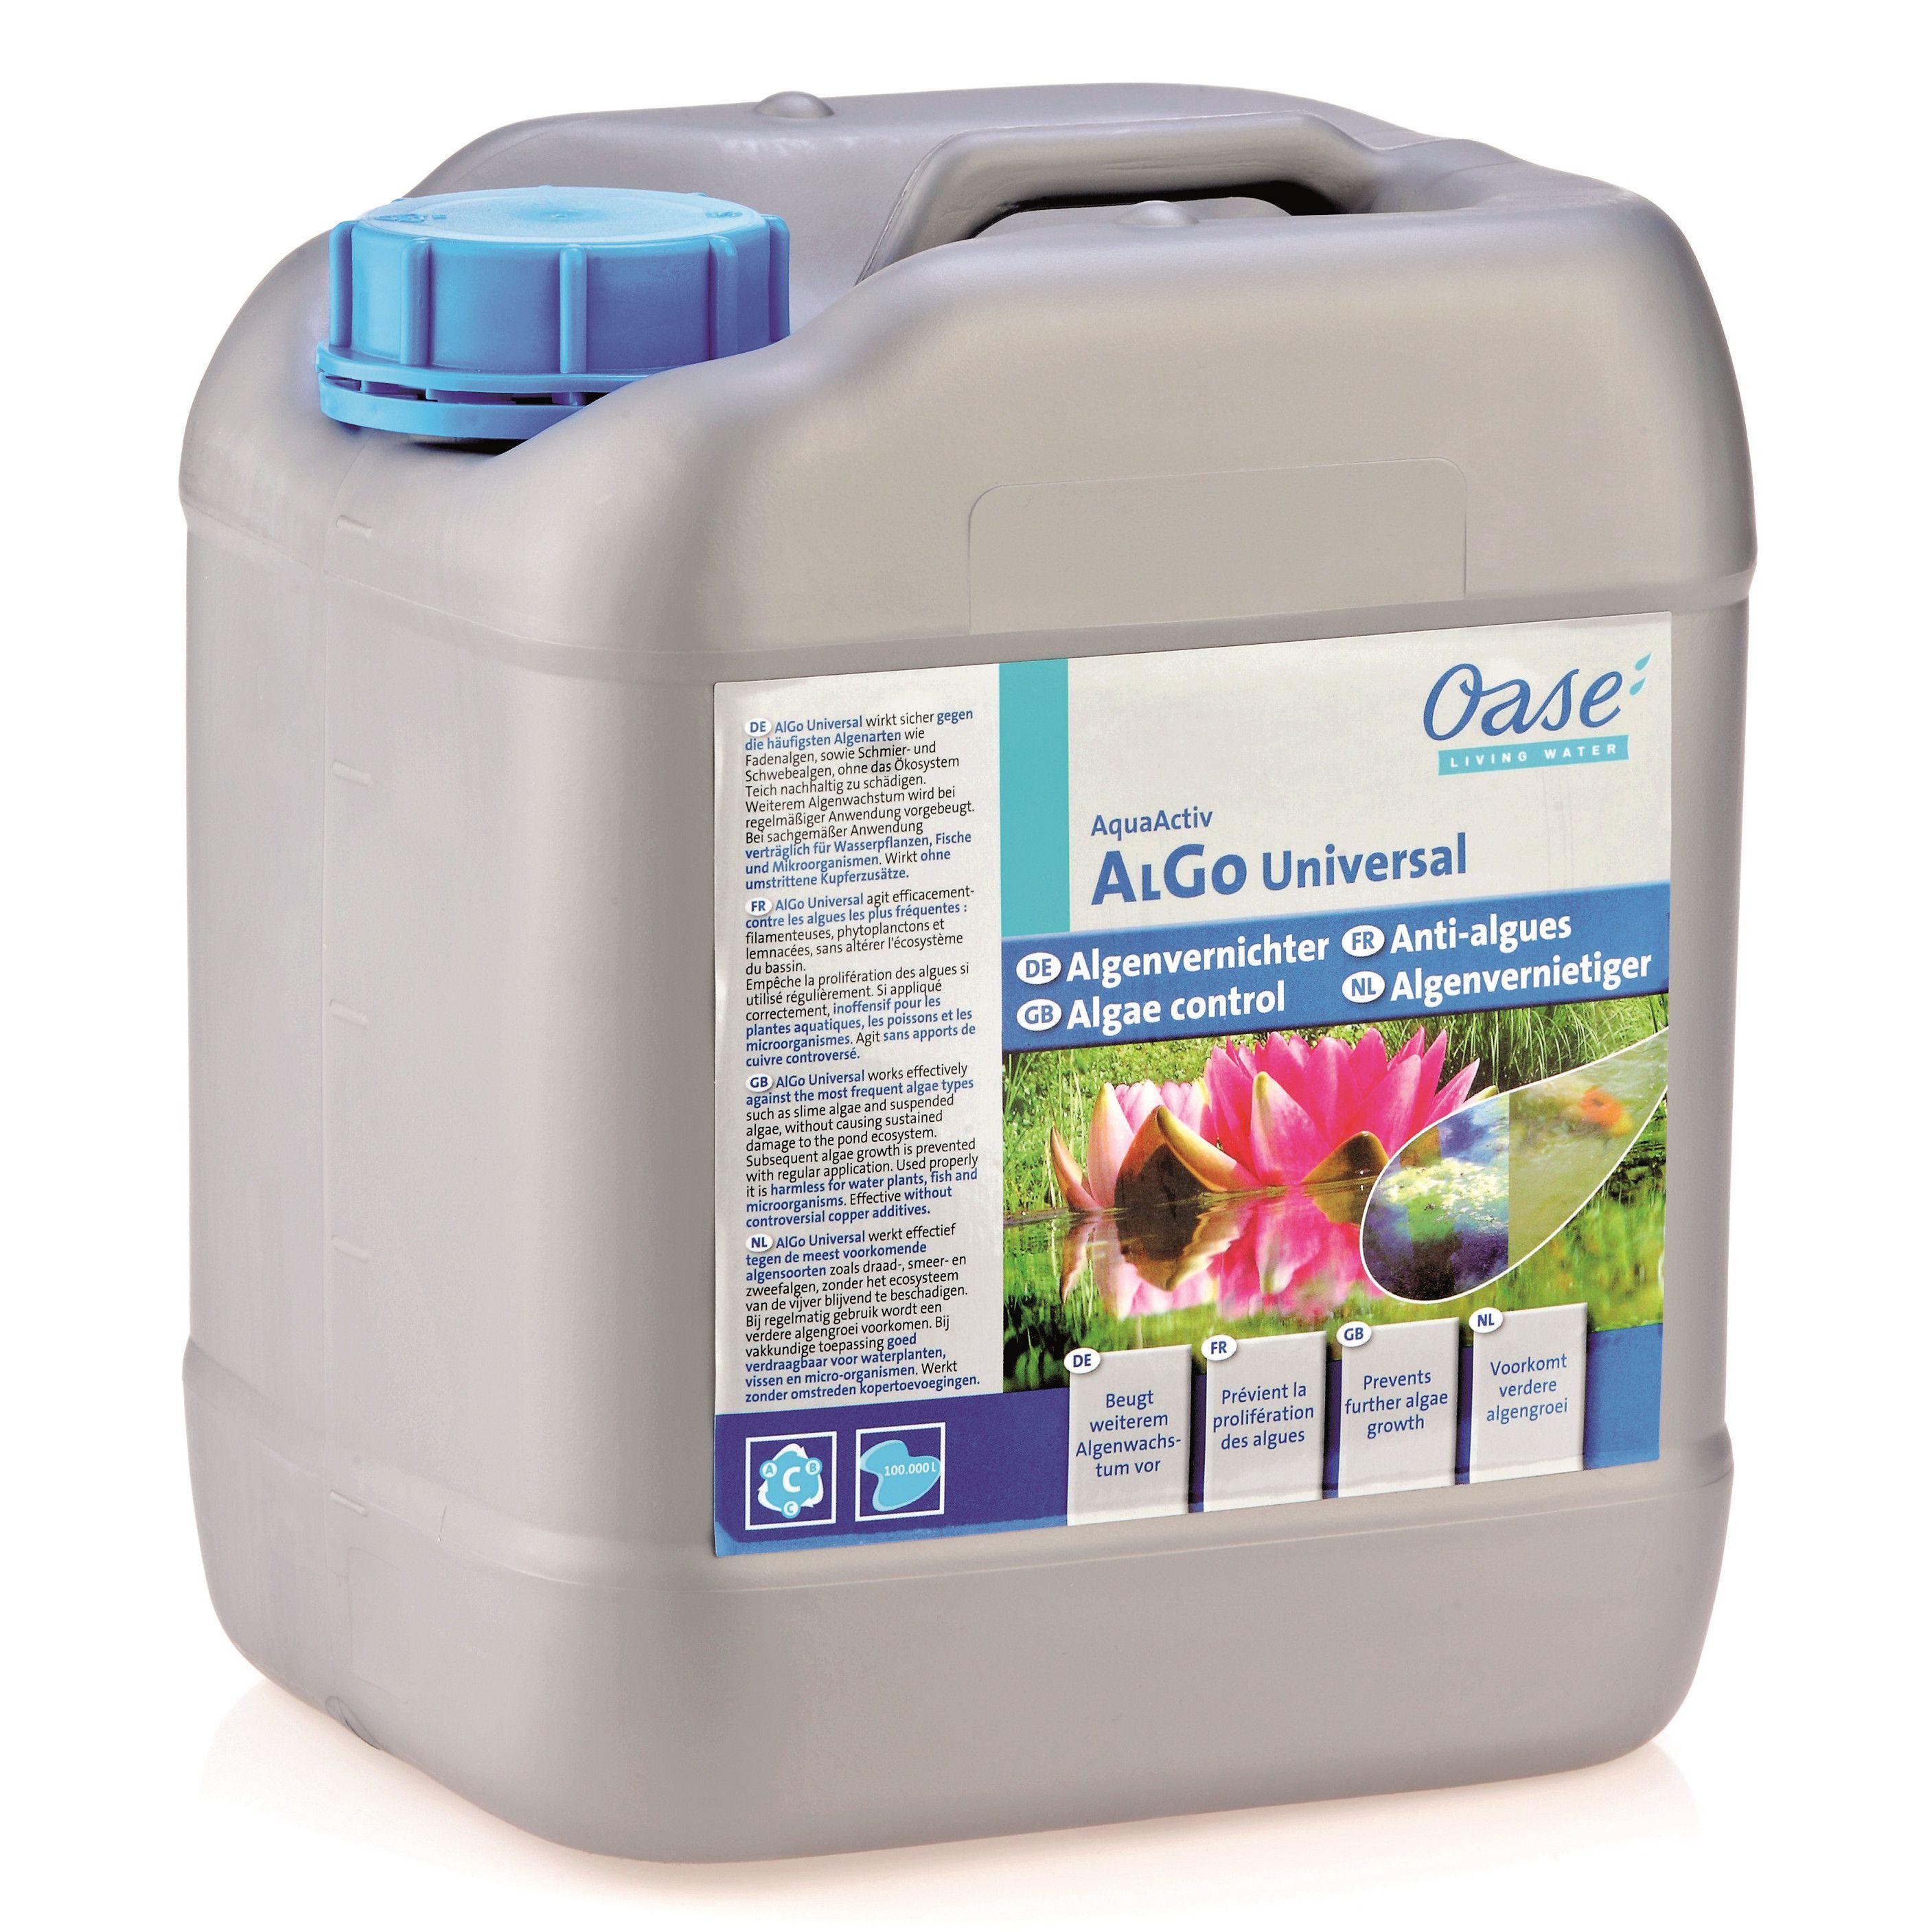 Oase AquaActiv AlGo Universal Algenvernichter 5000 ml für 10000 L